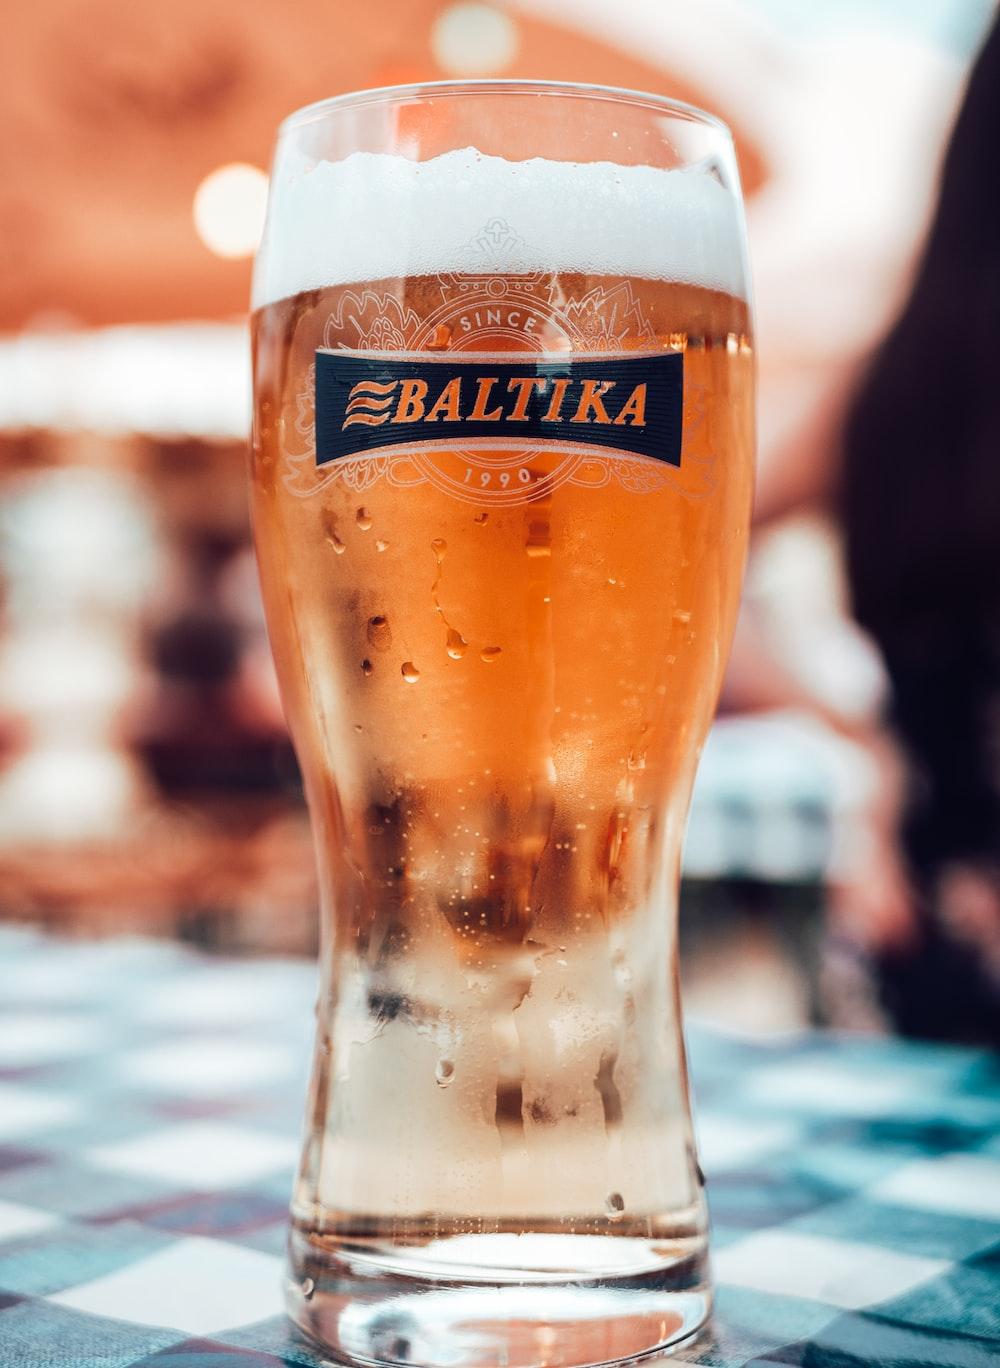 Baltika drinking glass photo